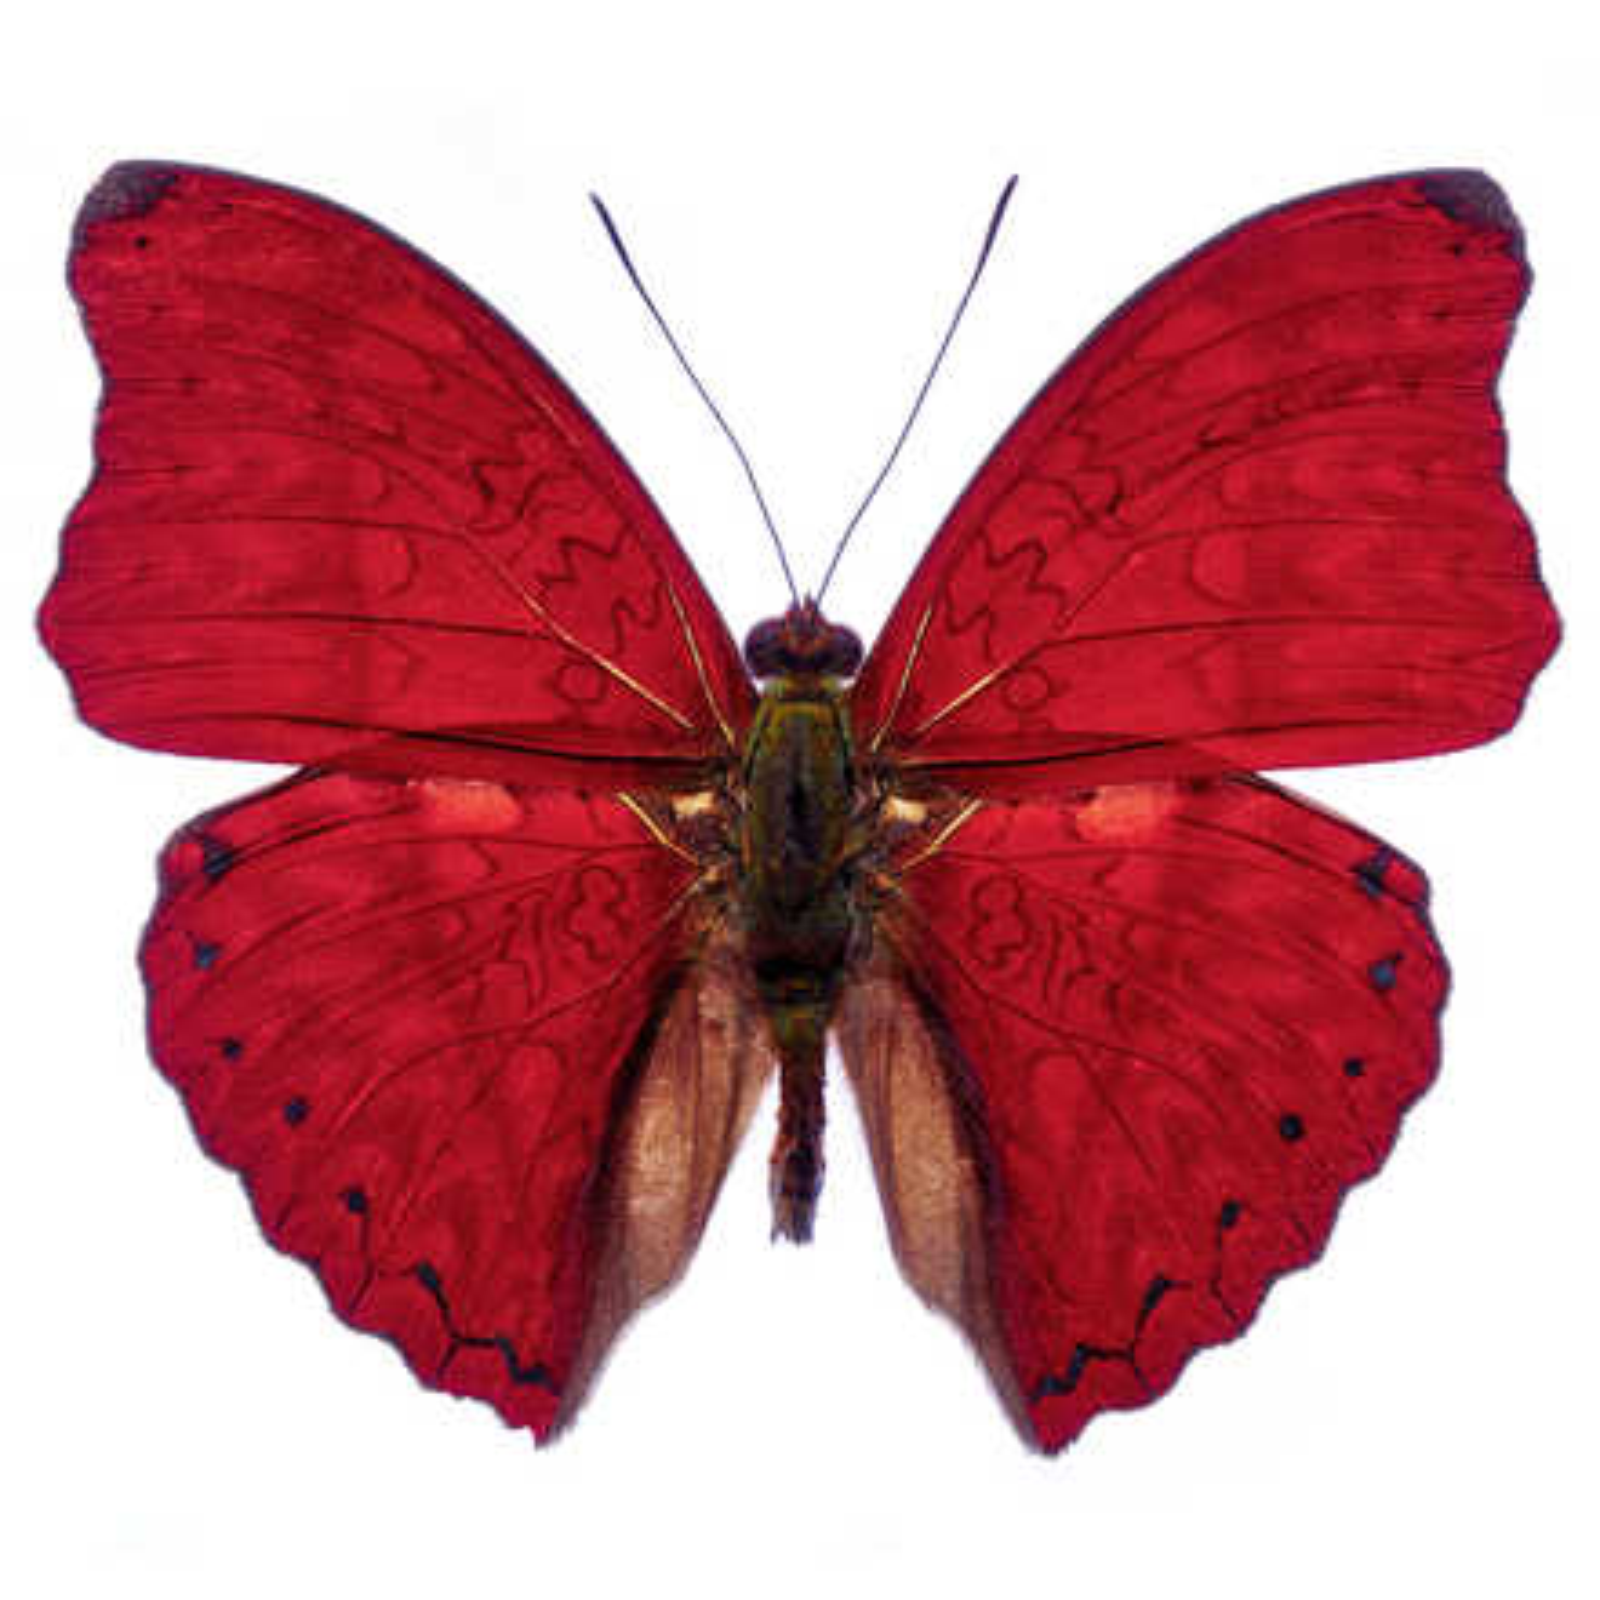 Butterfly VII - Heiko Hellwig